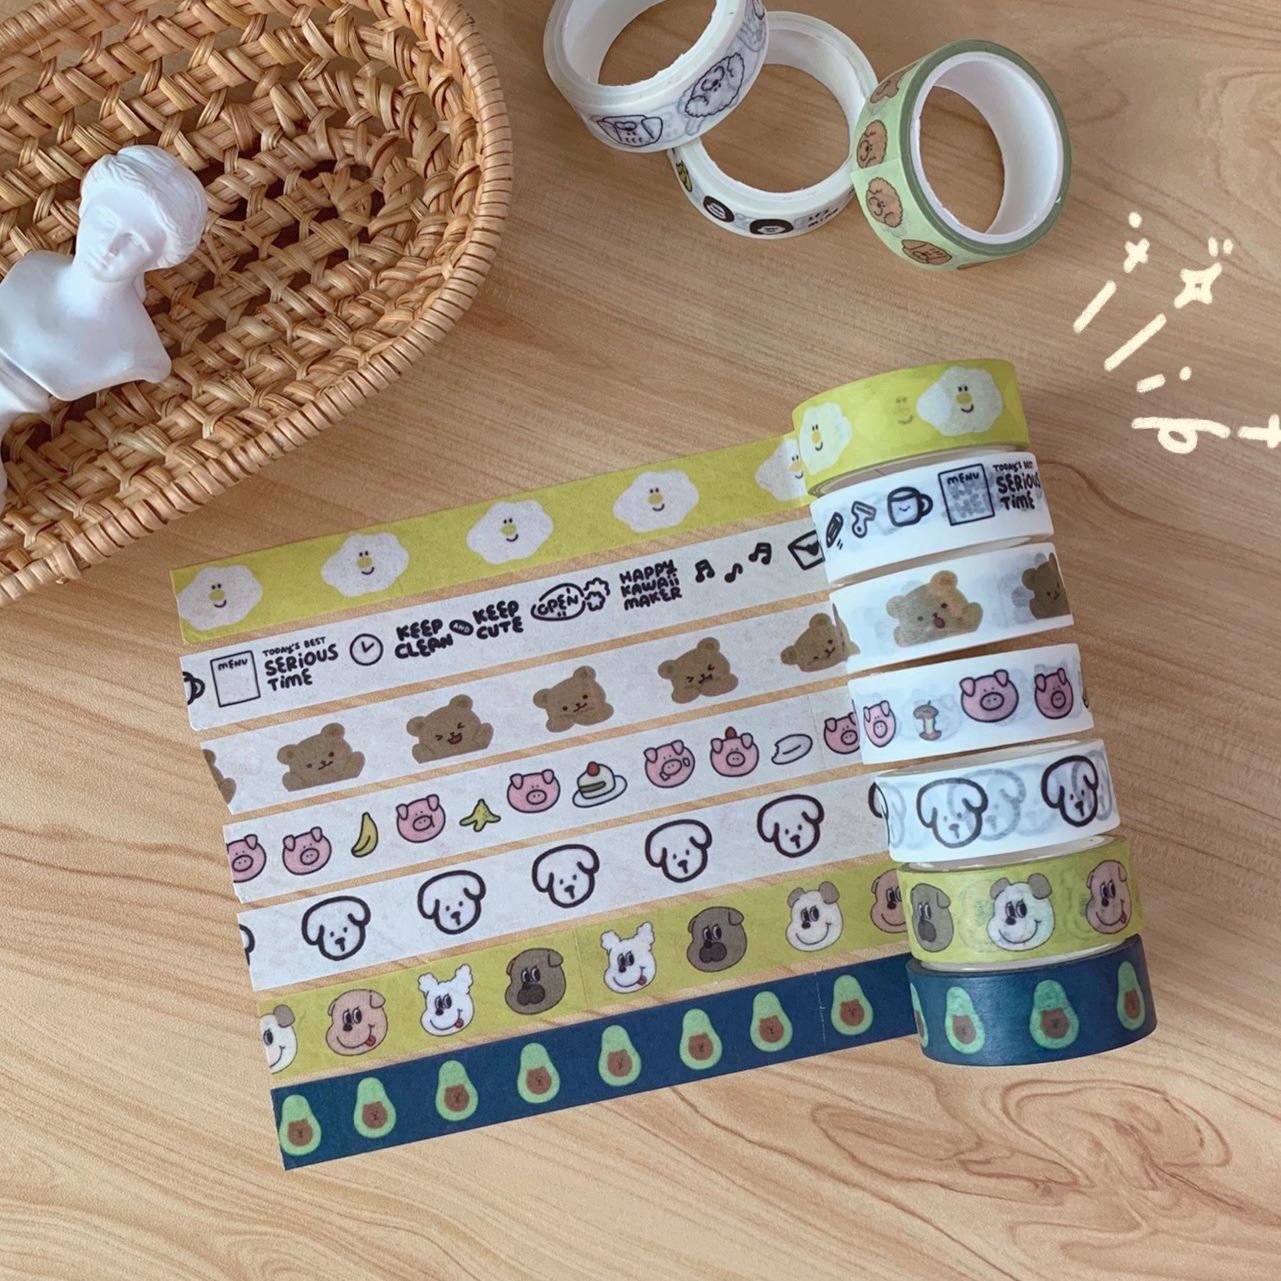 1 Roll Kawaii Washi Tape Cute Animal Alphabet Pattern Translucent Stationery Washi Tape Masking Tape Diary Journal Decoration